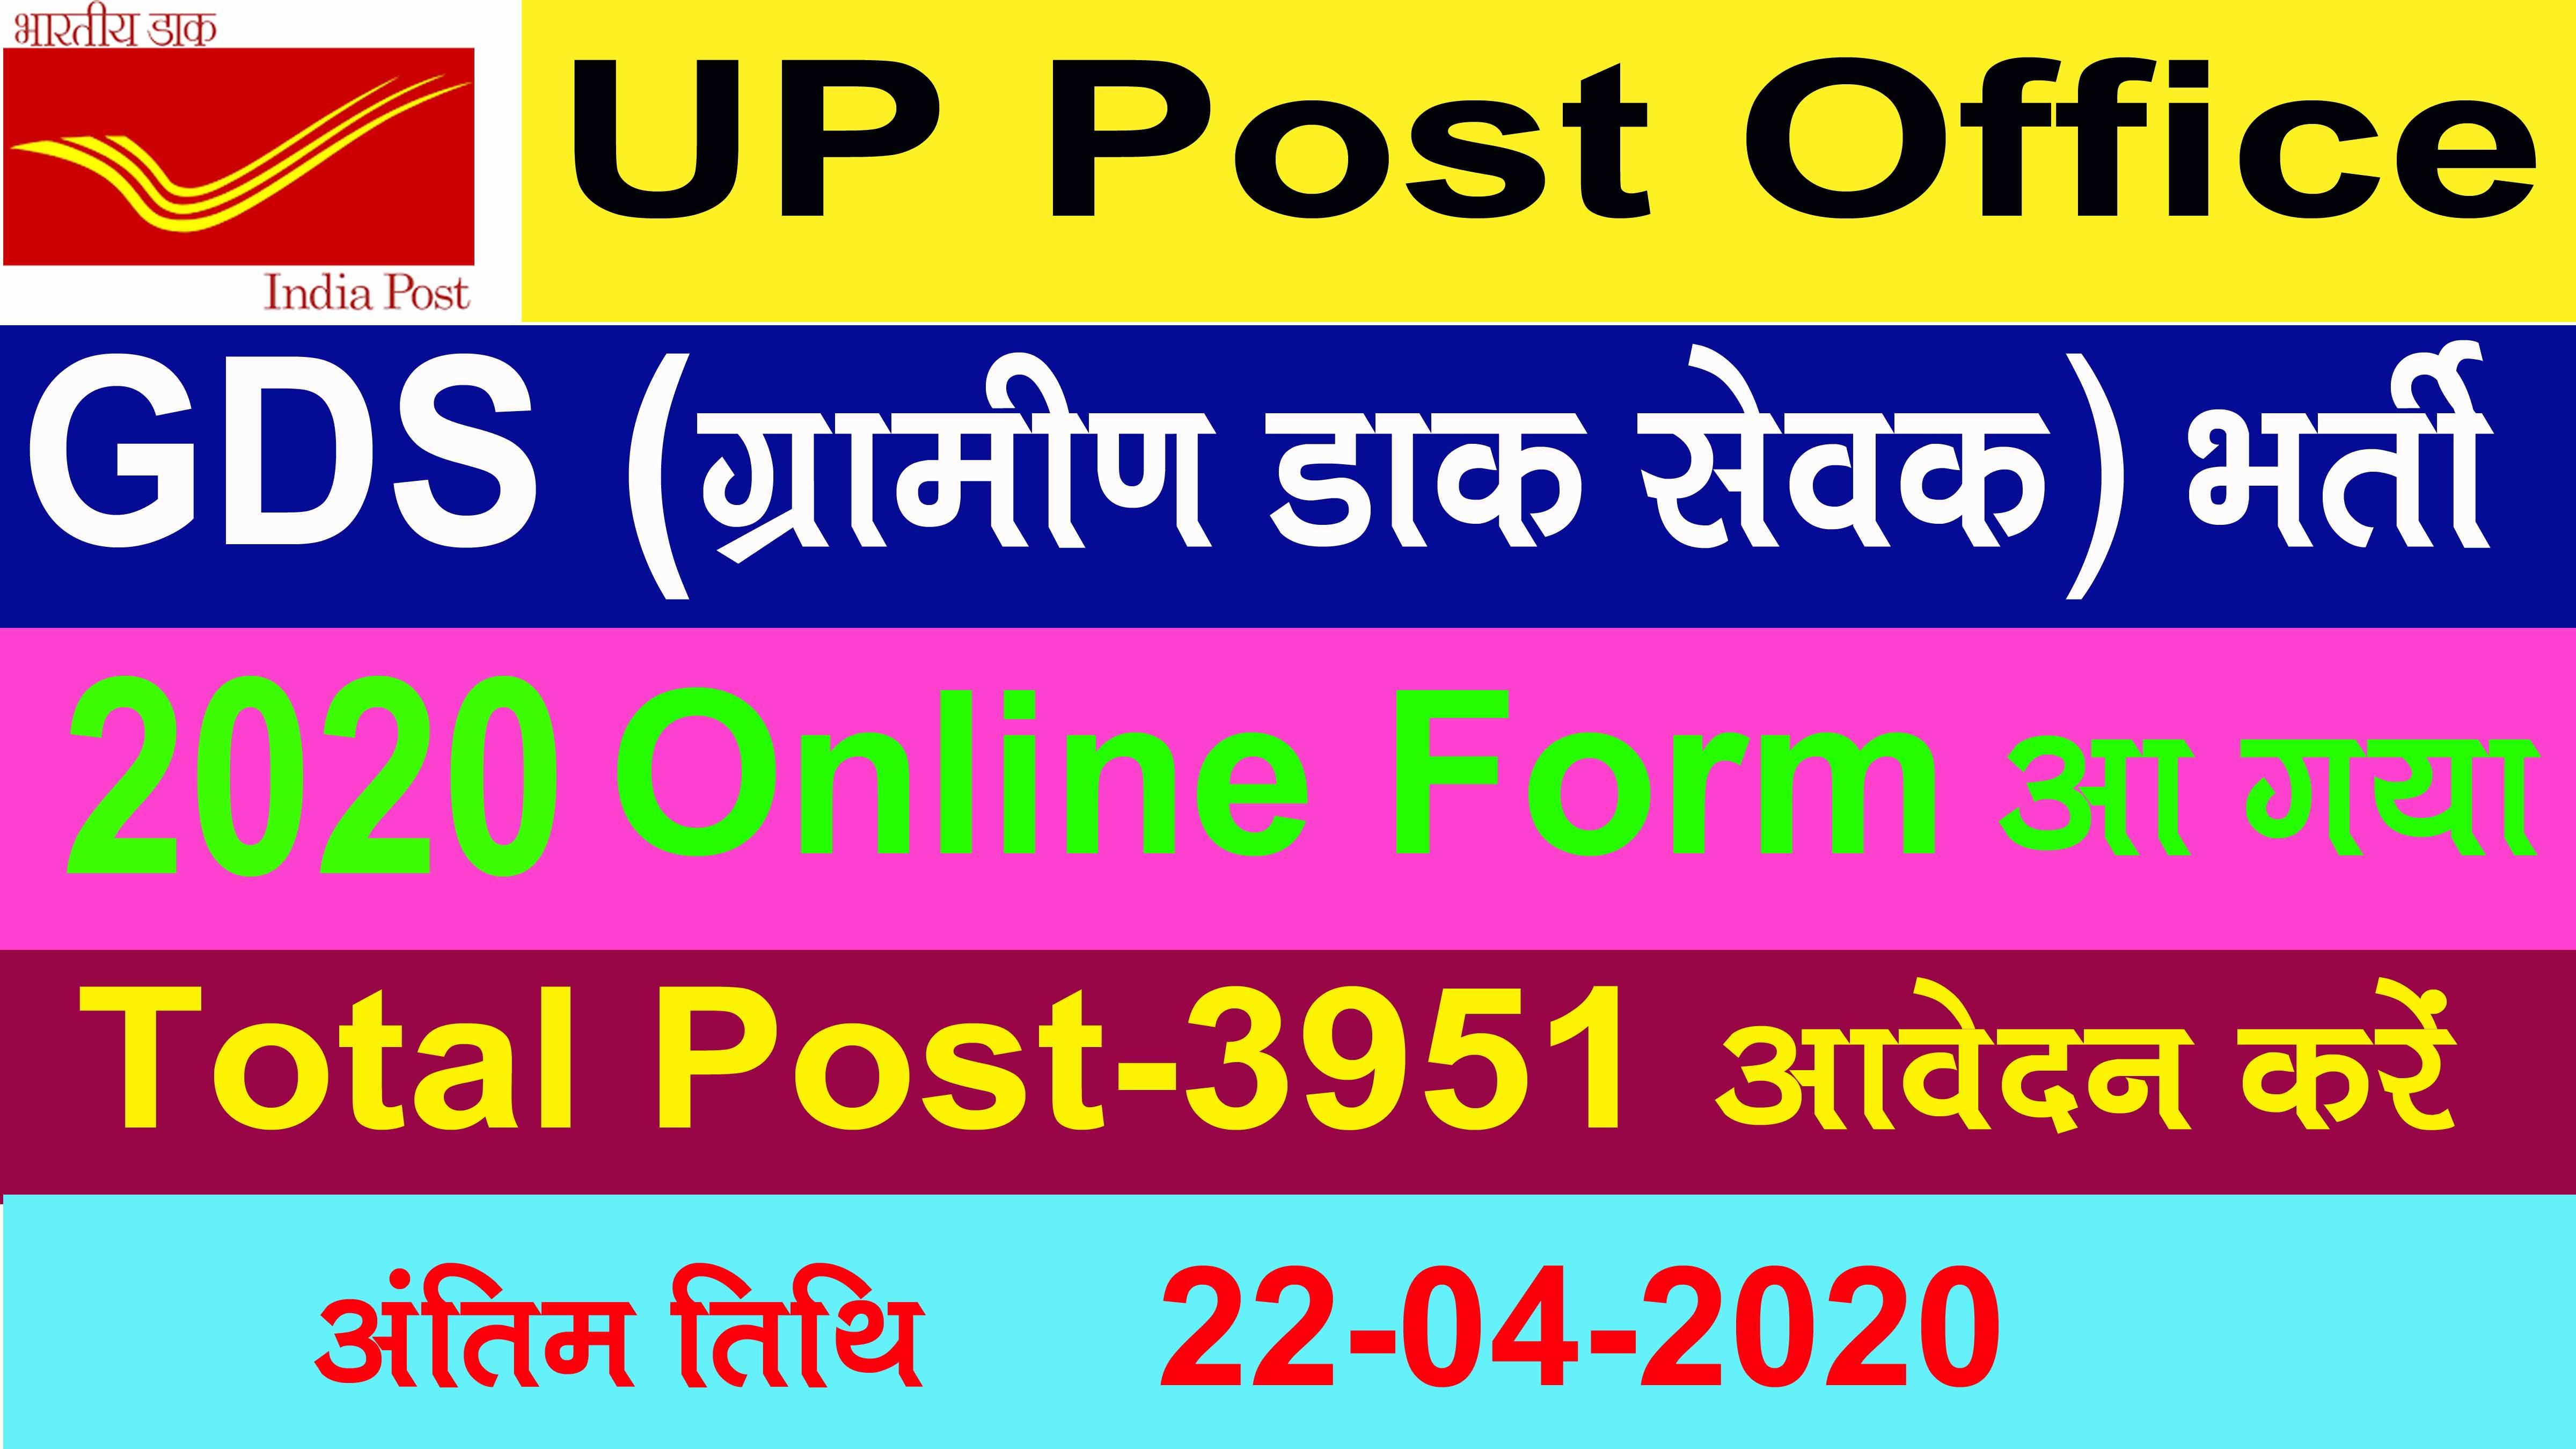 UP Post Office Vacancy 2020